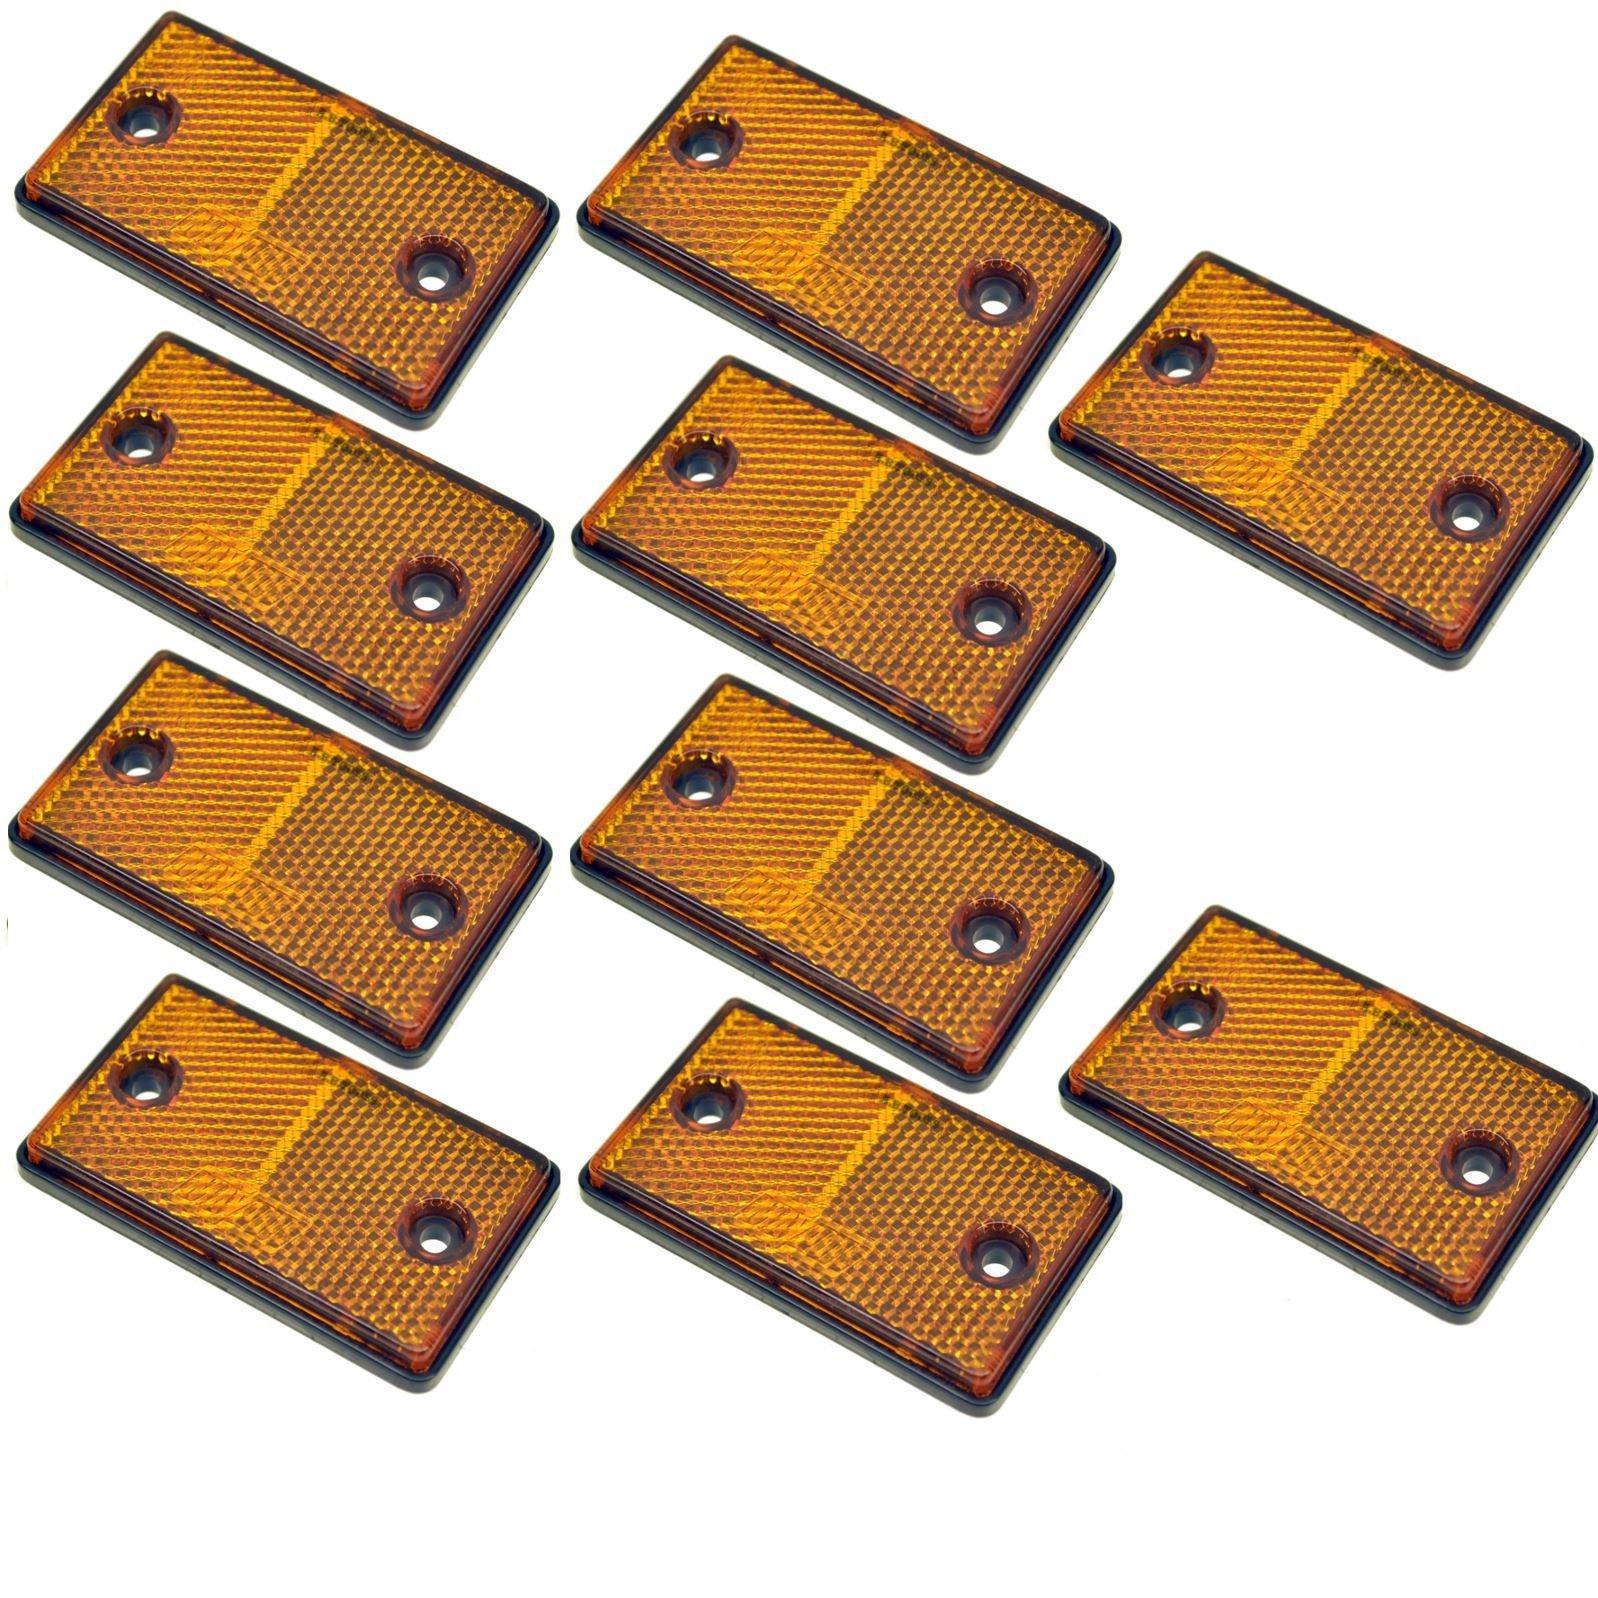 Amber Rectangular Side Reflector Pack of 10 Trailer Fence Gate Post TR068